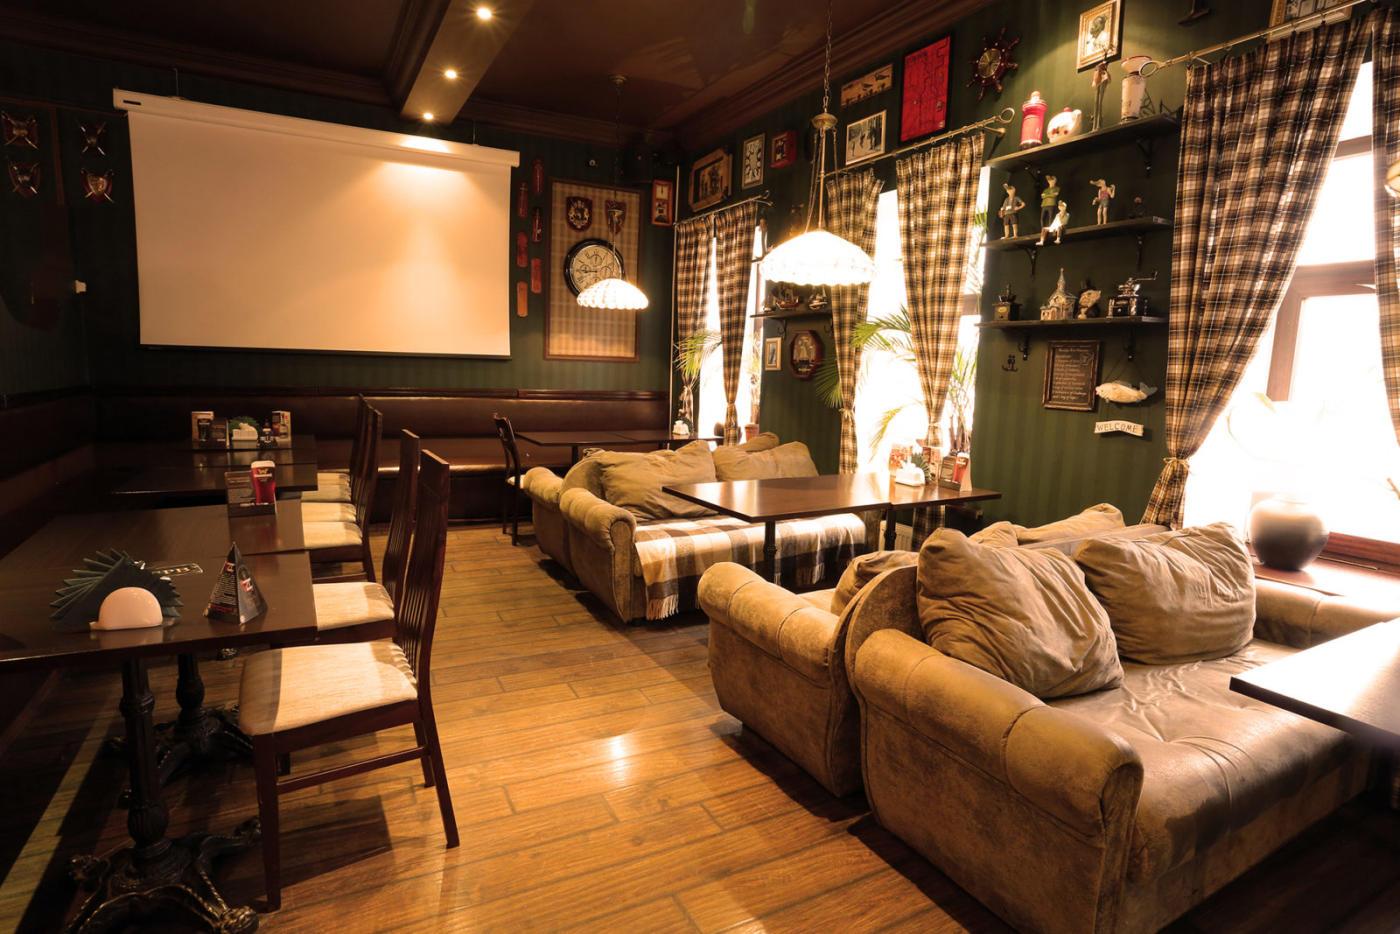 Английский Пивной ресторан London Time Pub на Таганке (Лондон Тайм Паб) фото